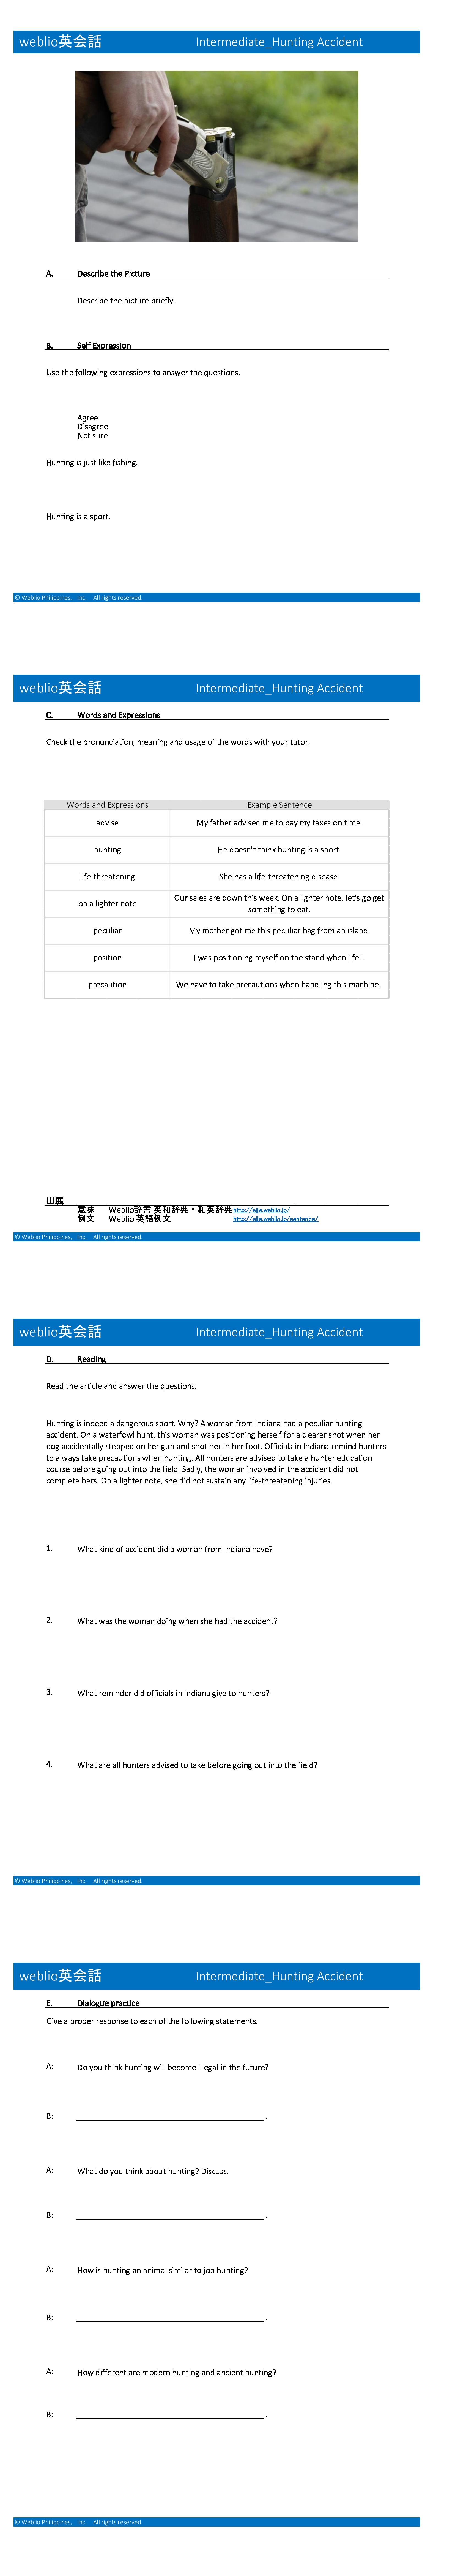 per-level-intermediate-hunting-accident-en